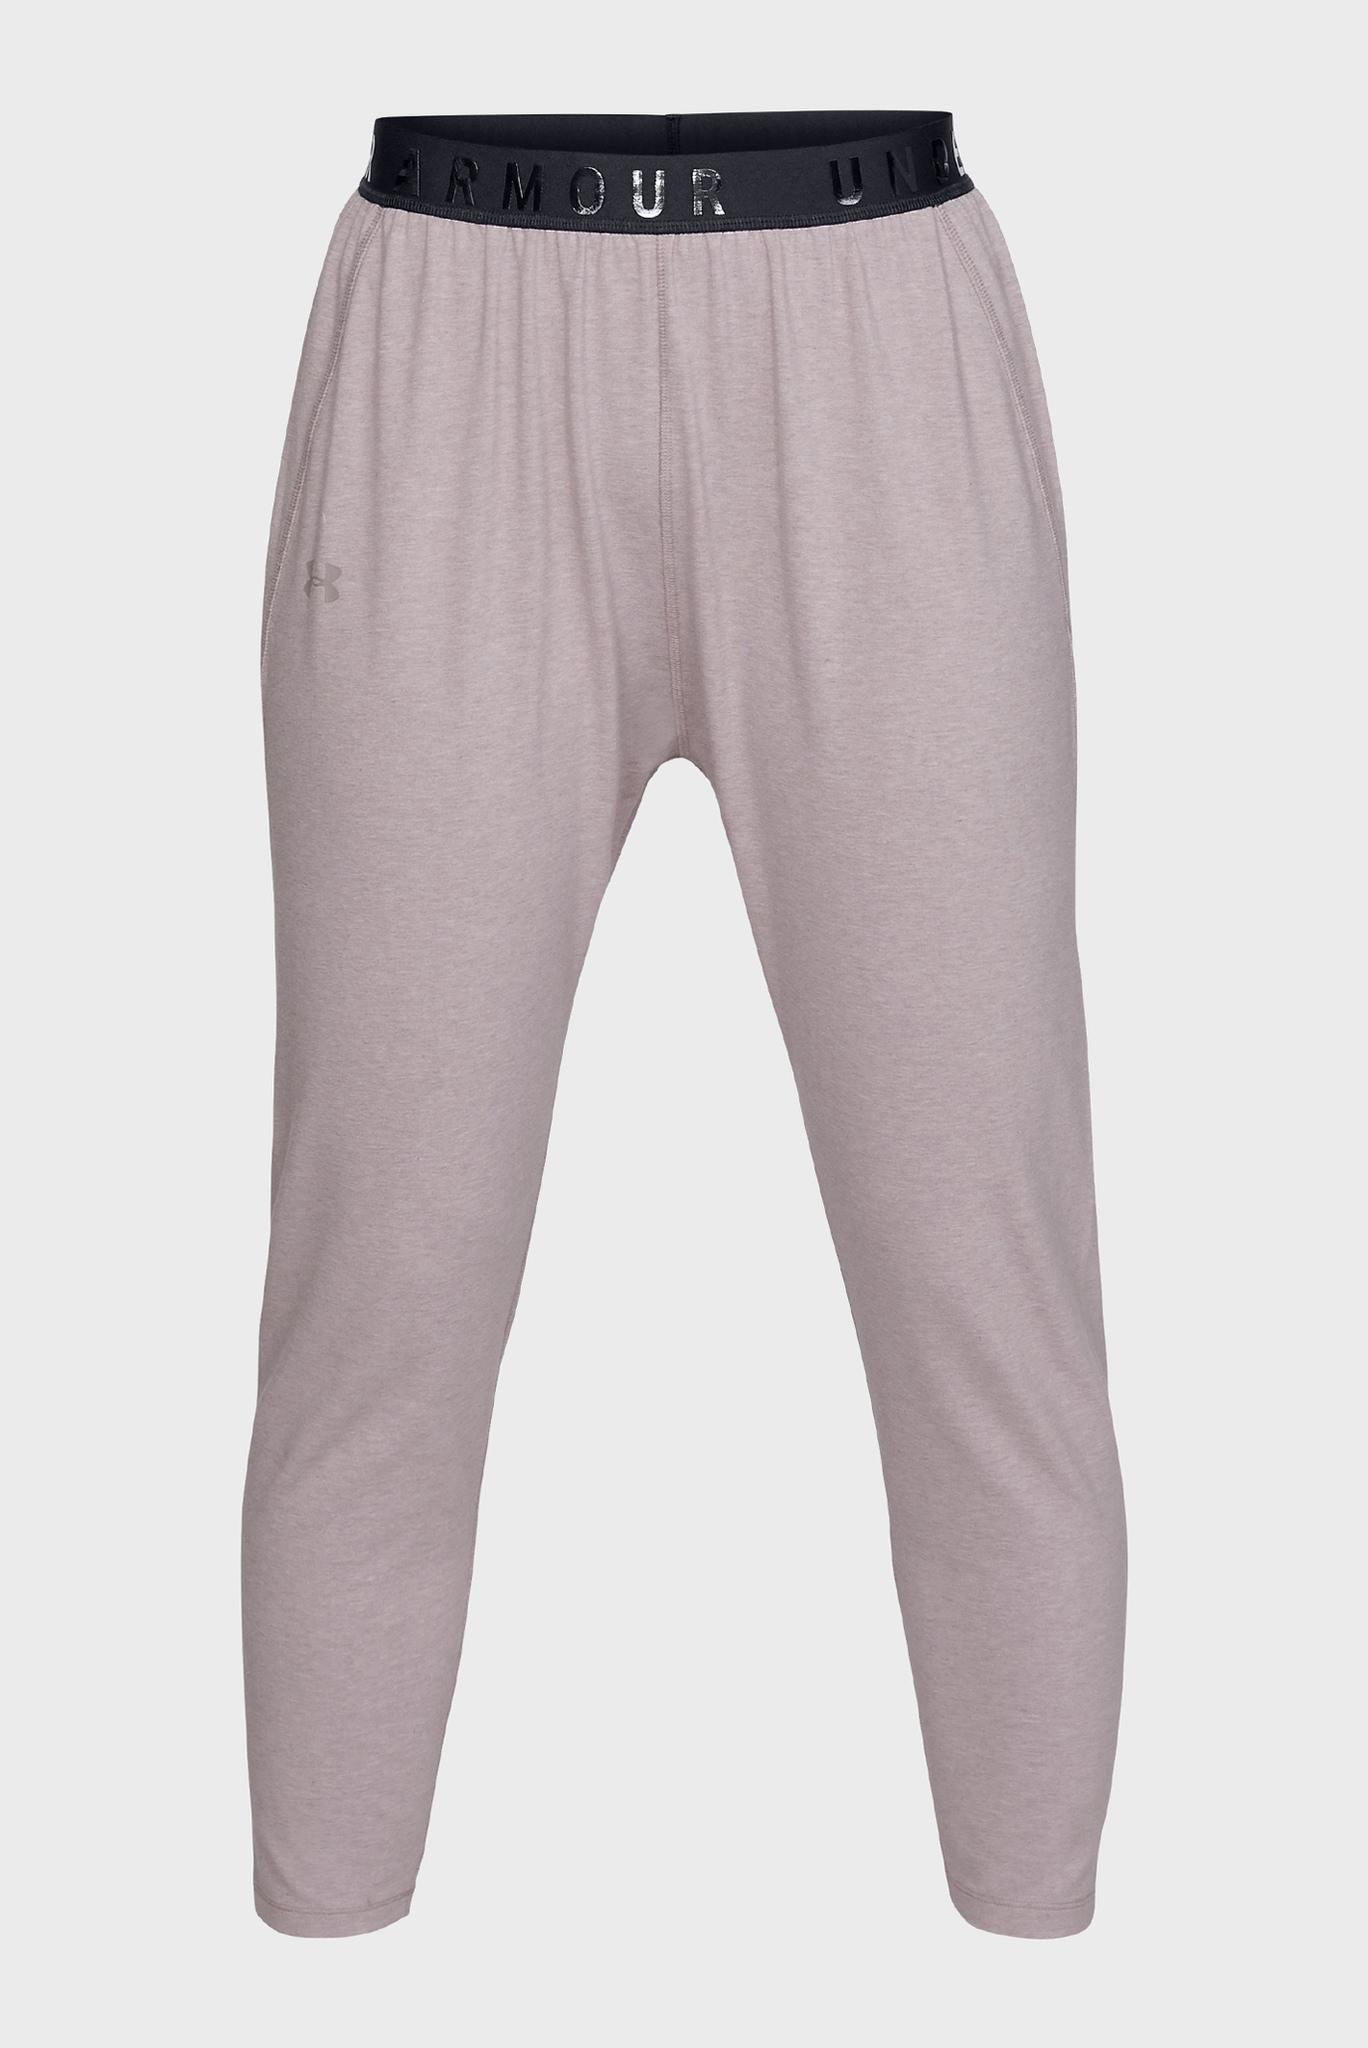 Женские серые спортивные брюки FAVORITE TAPERED SLOUCH Under Armour